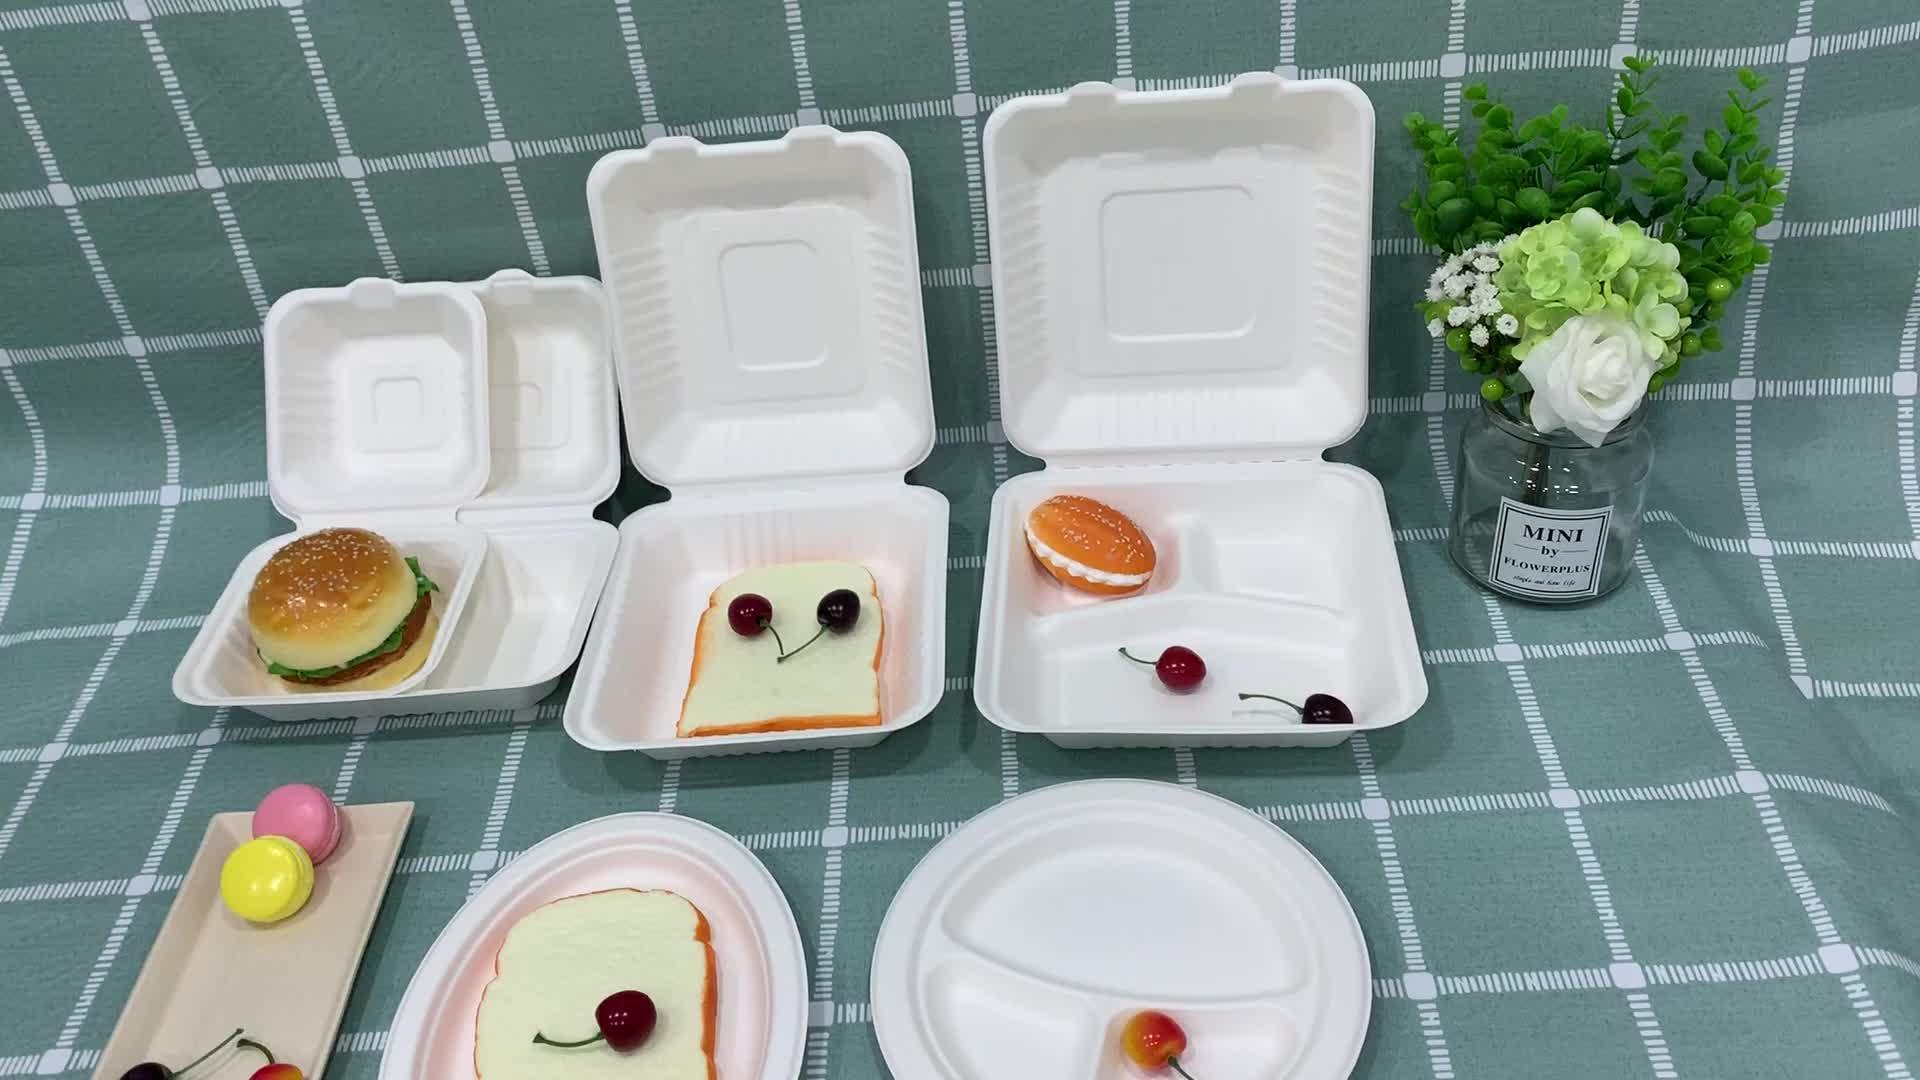 Sugarcane Bagasse Disposable Party Dinnerware Paper Plate Set